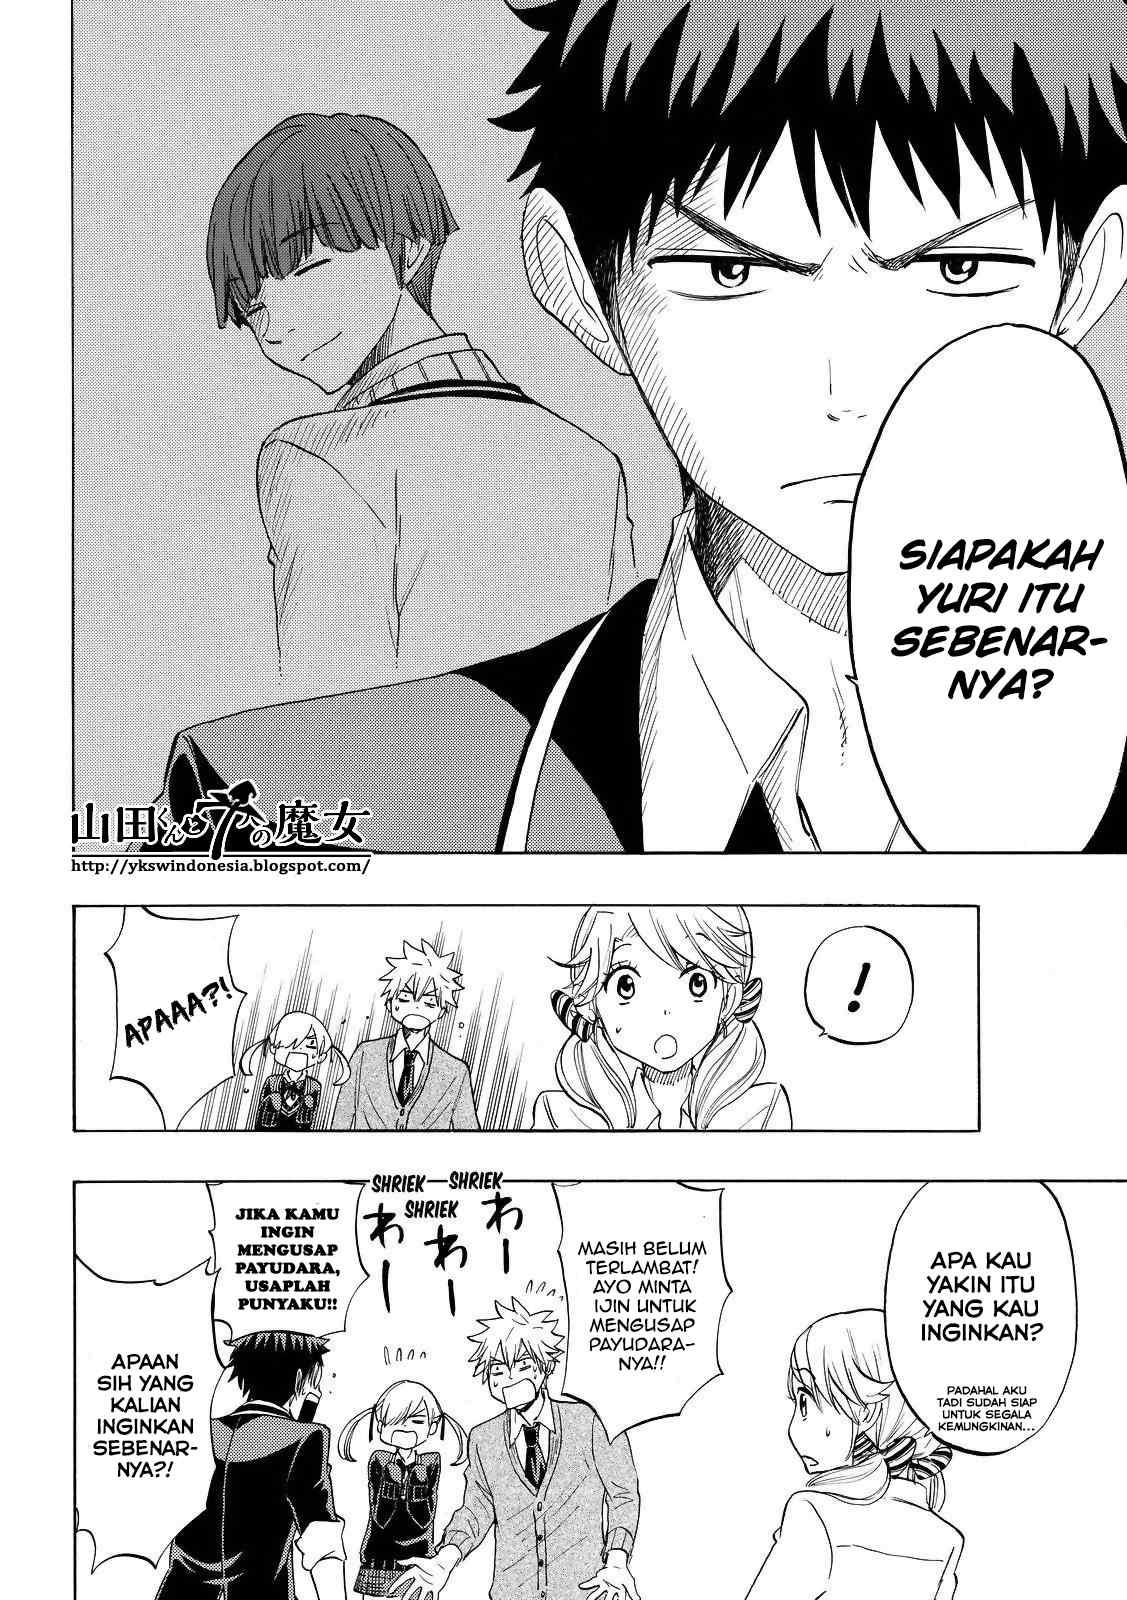 Dilarang COPAS - situs resmi www.mangacanblog.com - Komik yamada kun 7 nin no majo 147 - izin untuk mengusap payudaranya 148 Indonesia yamada kun 7 nin no majo 147 - izin untuk mengusap payudaranya Terbaru 11|Baca Manga Komik Indonesia|Mangacan